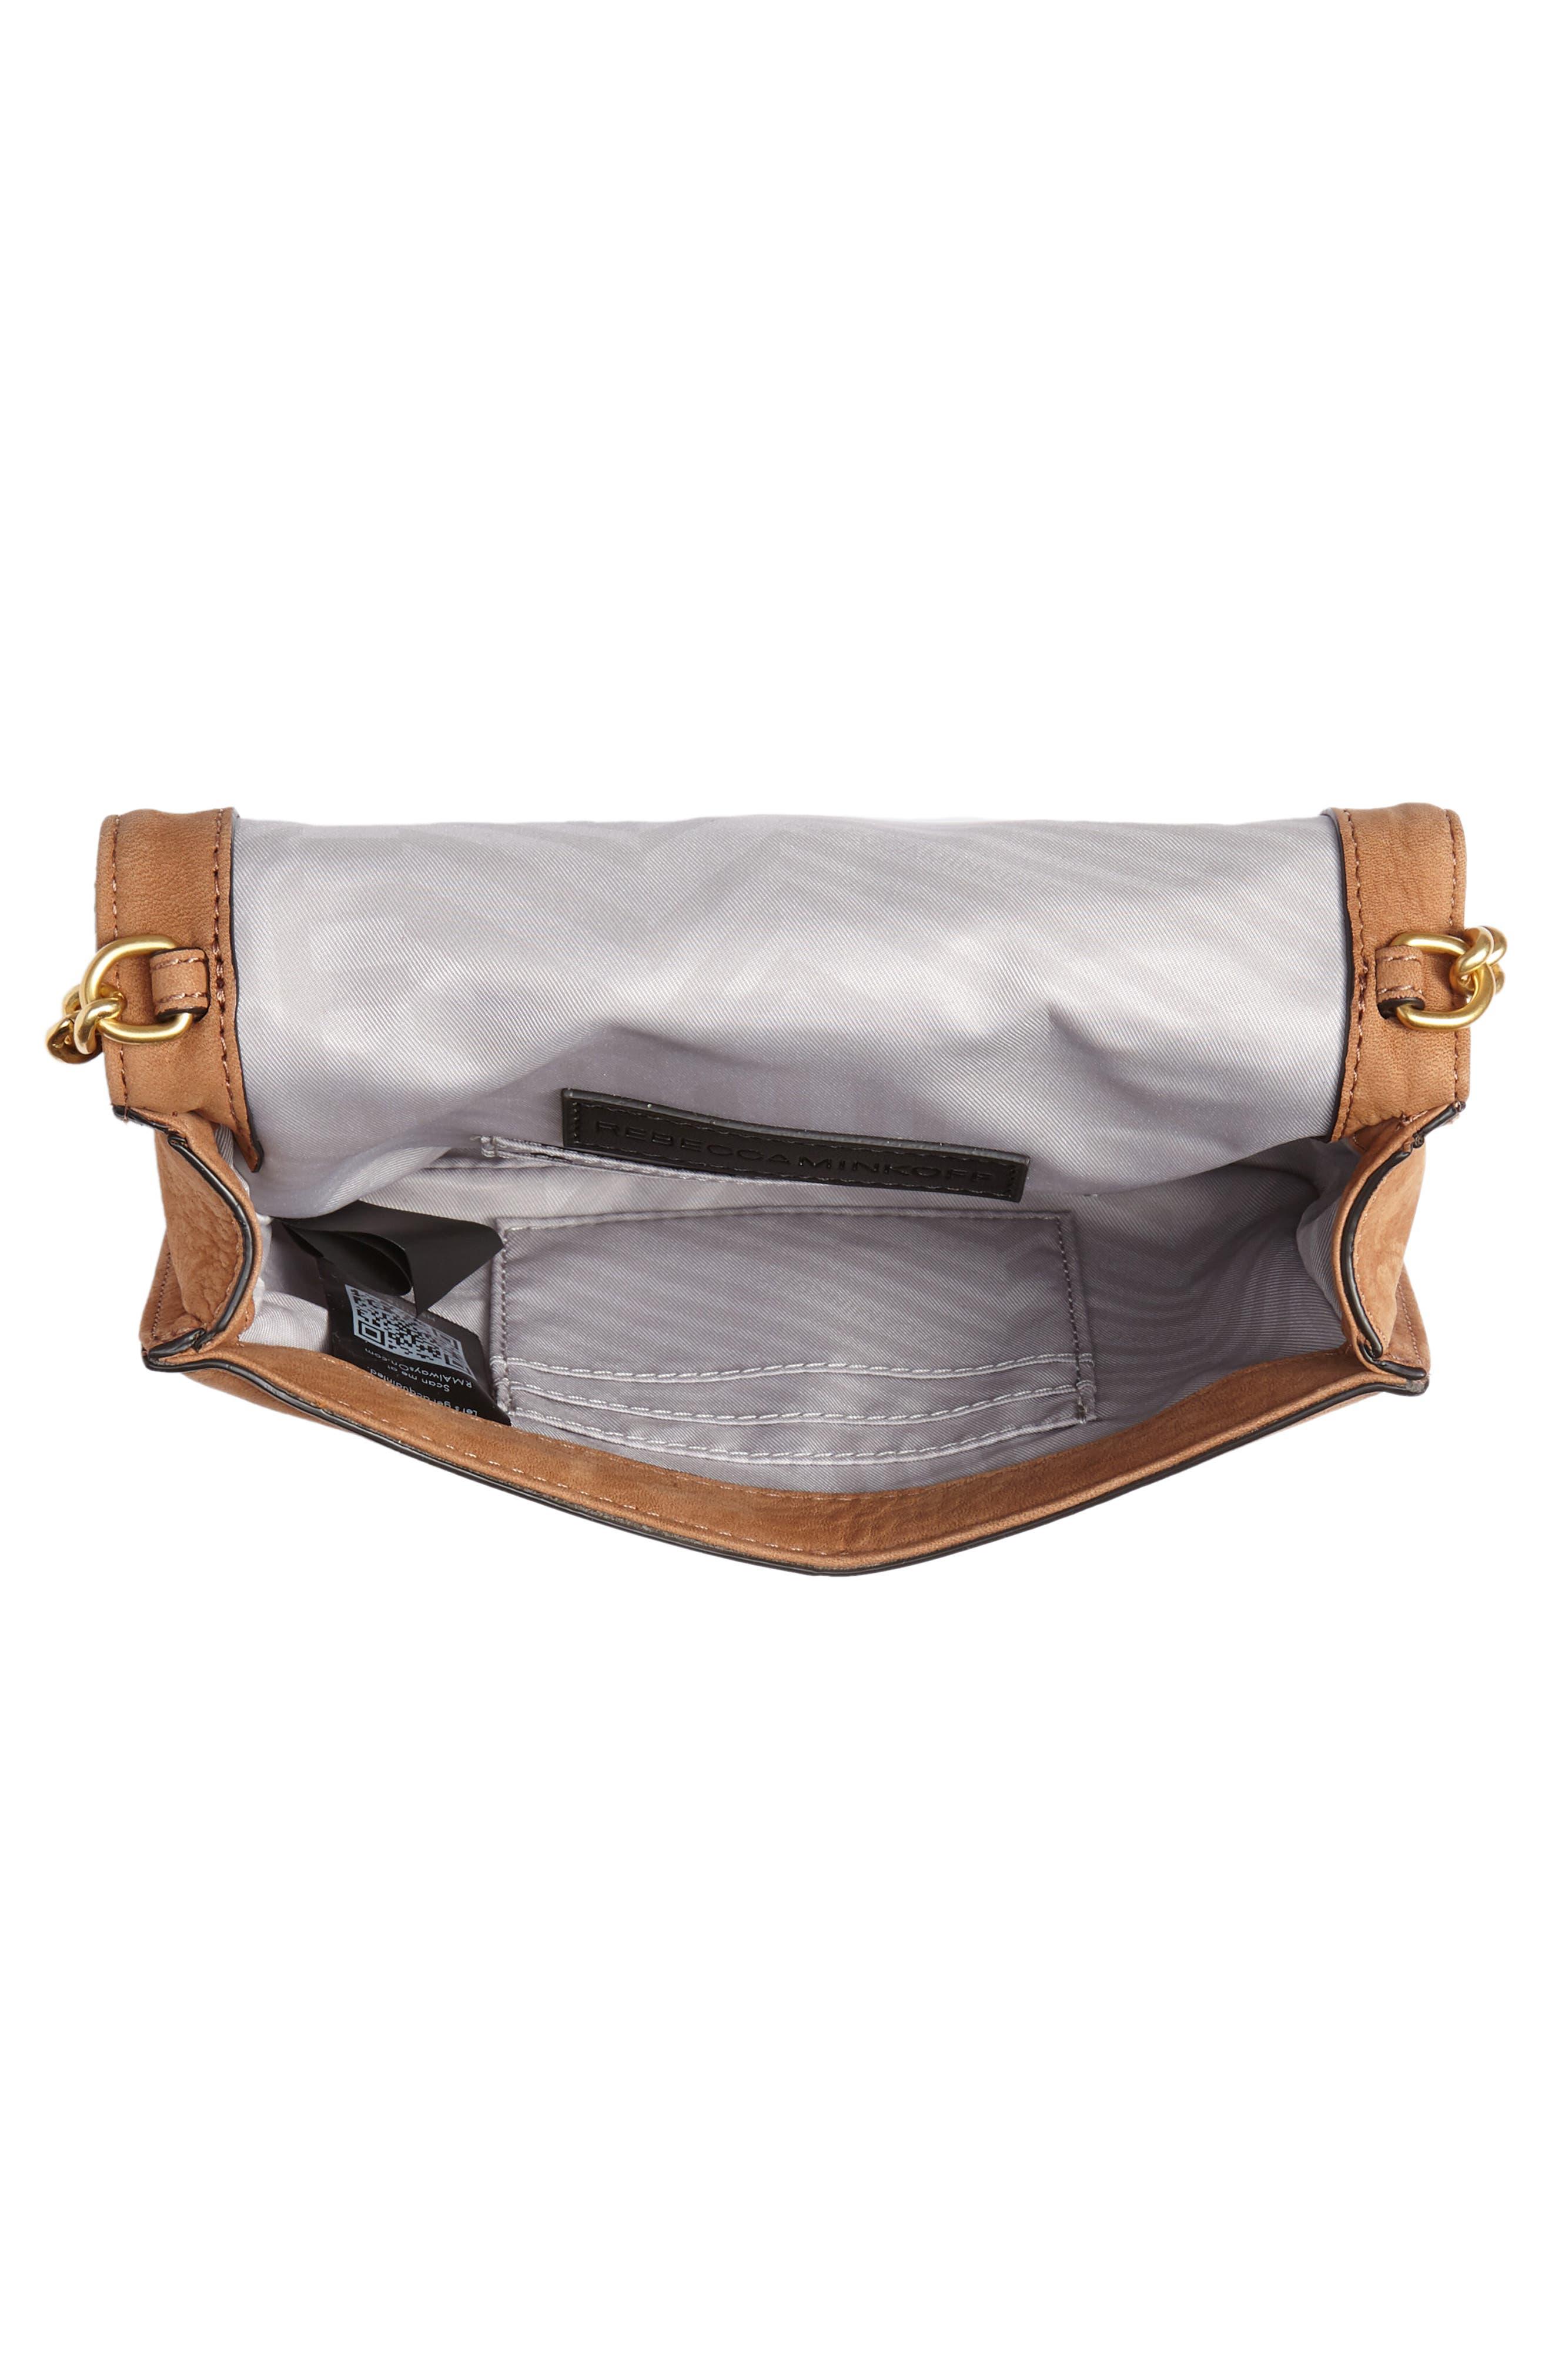 Small Love Nubuck Leather Crossbody Bag,                             Alternate thumbnail 5, color,                             Almond